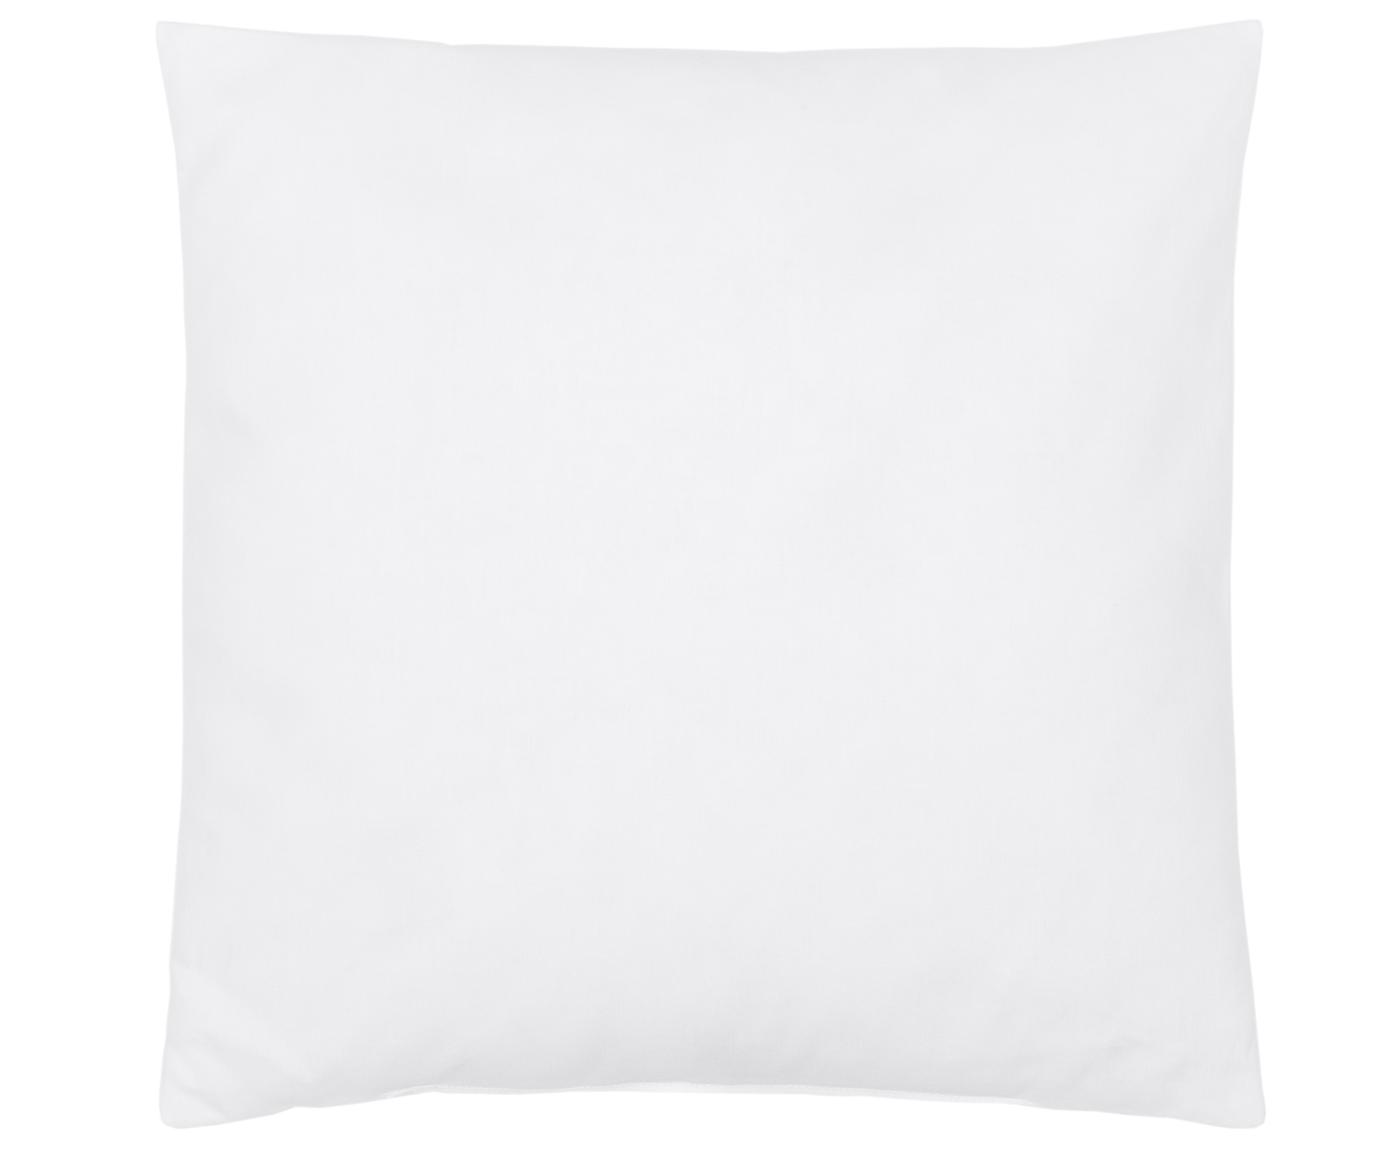 Imbottitura per cuscini in microfibra Sia, 40 x 40, Bianco, Larg. 40 x Lung. 40 cm